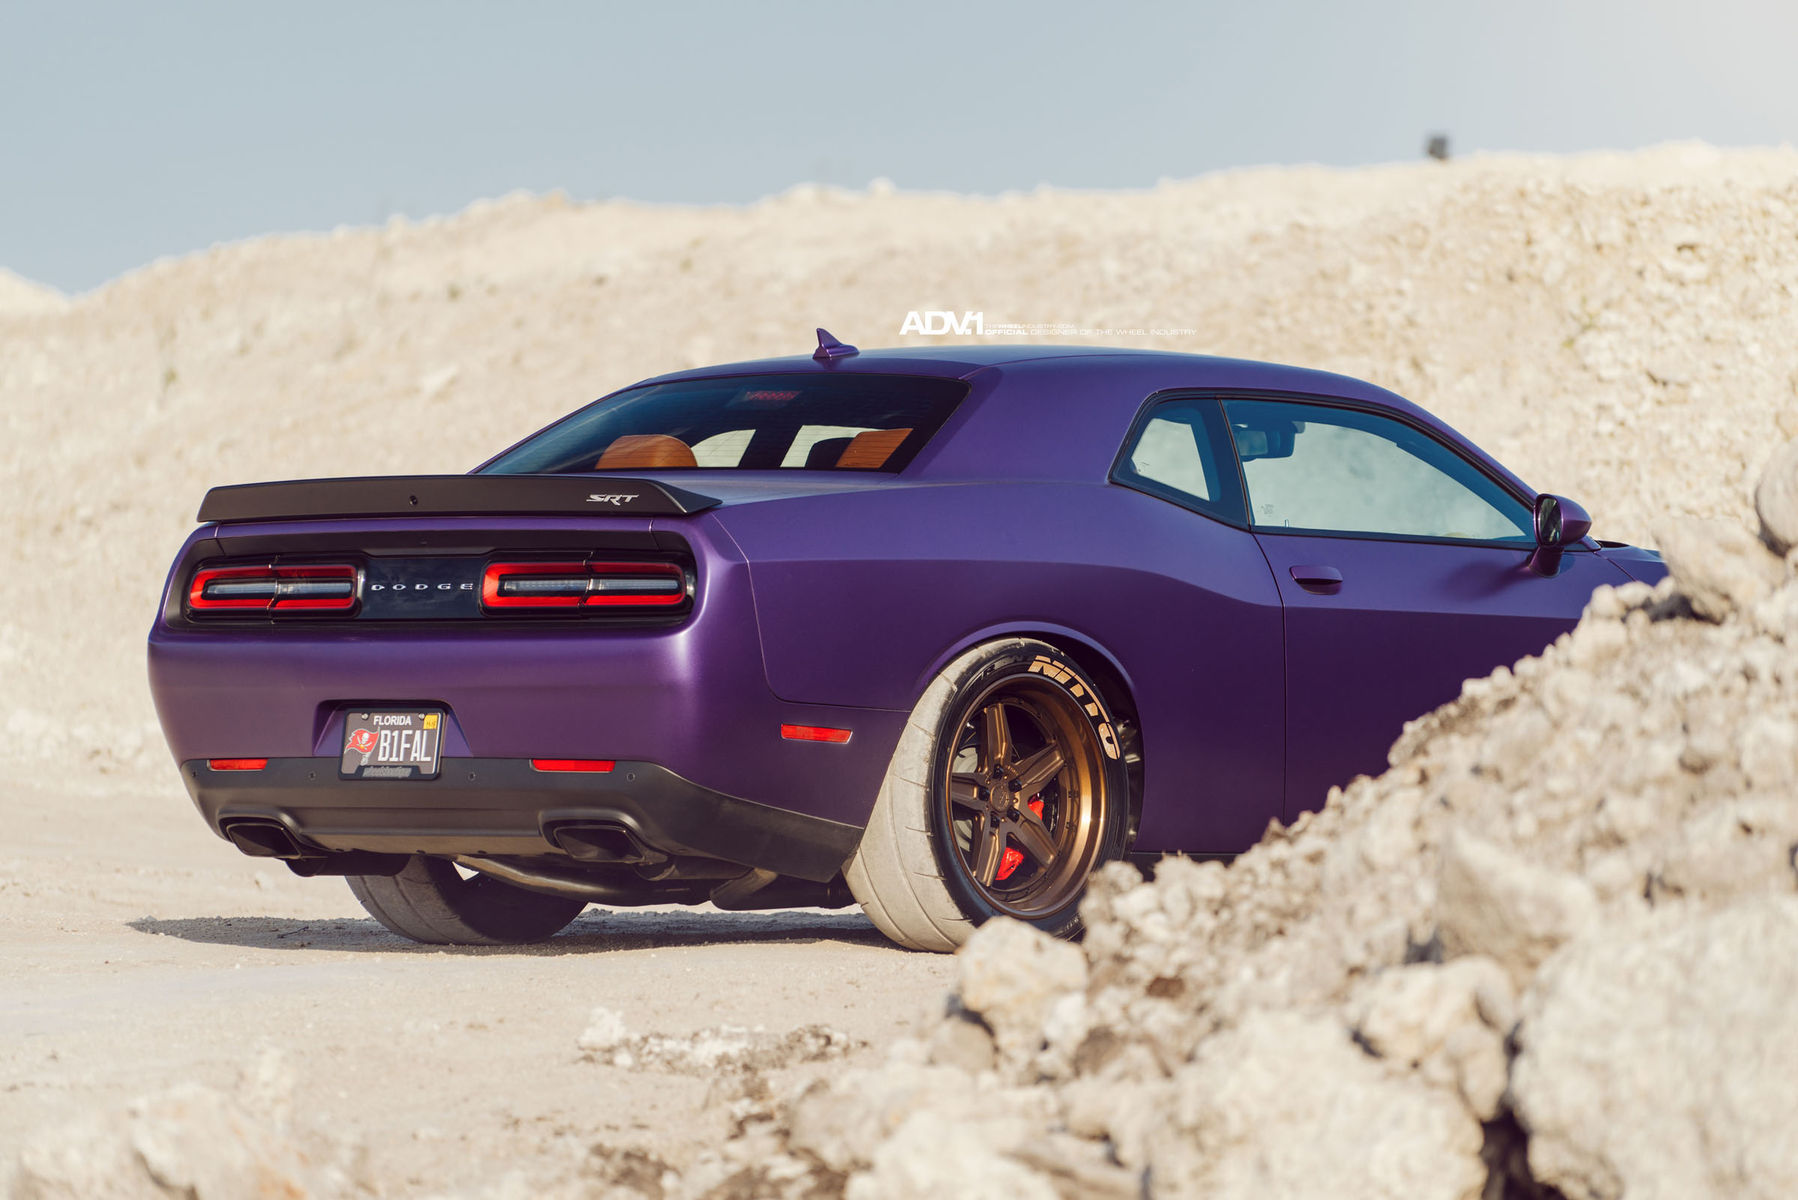 2016 Dodge Challenger | ADV.1 Dodge Challenger Hellcat